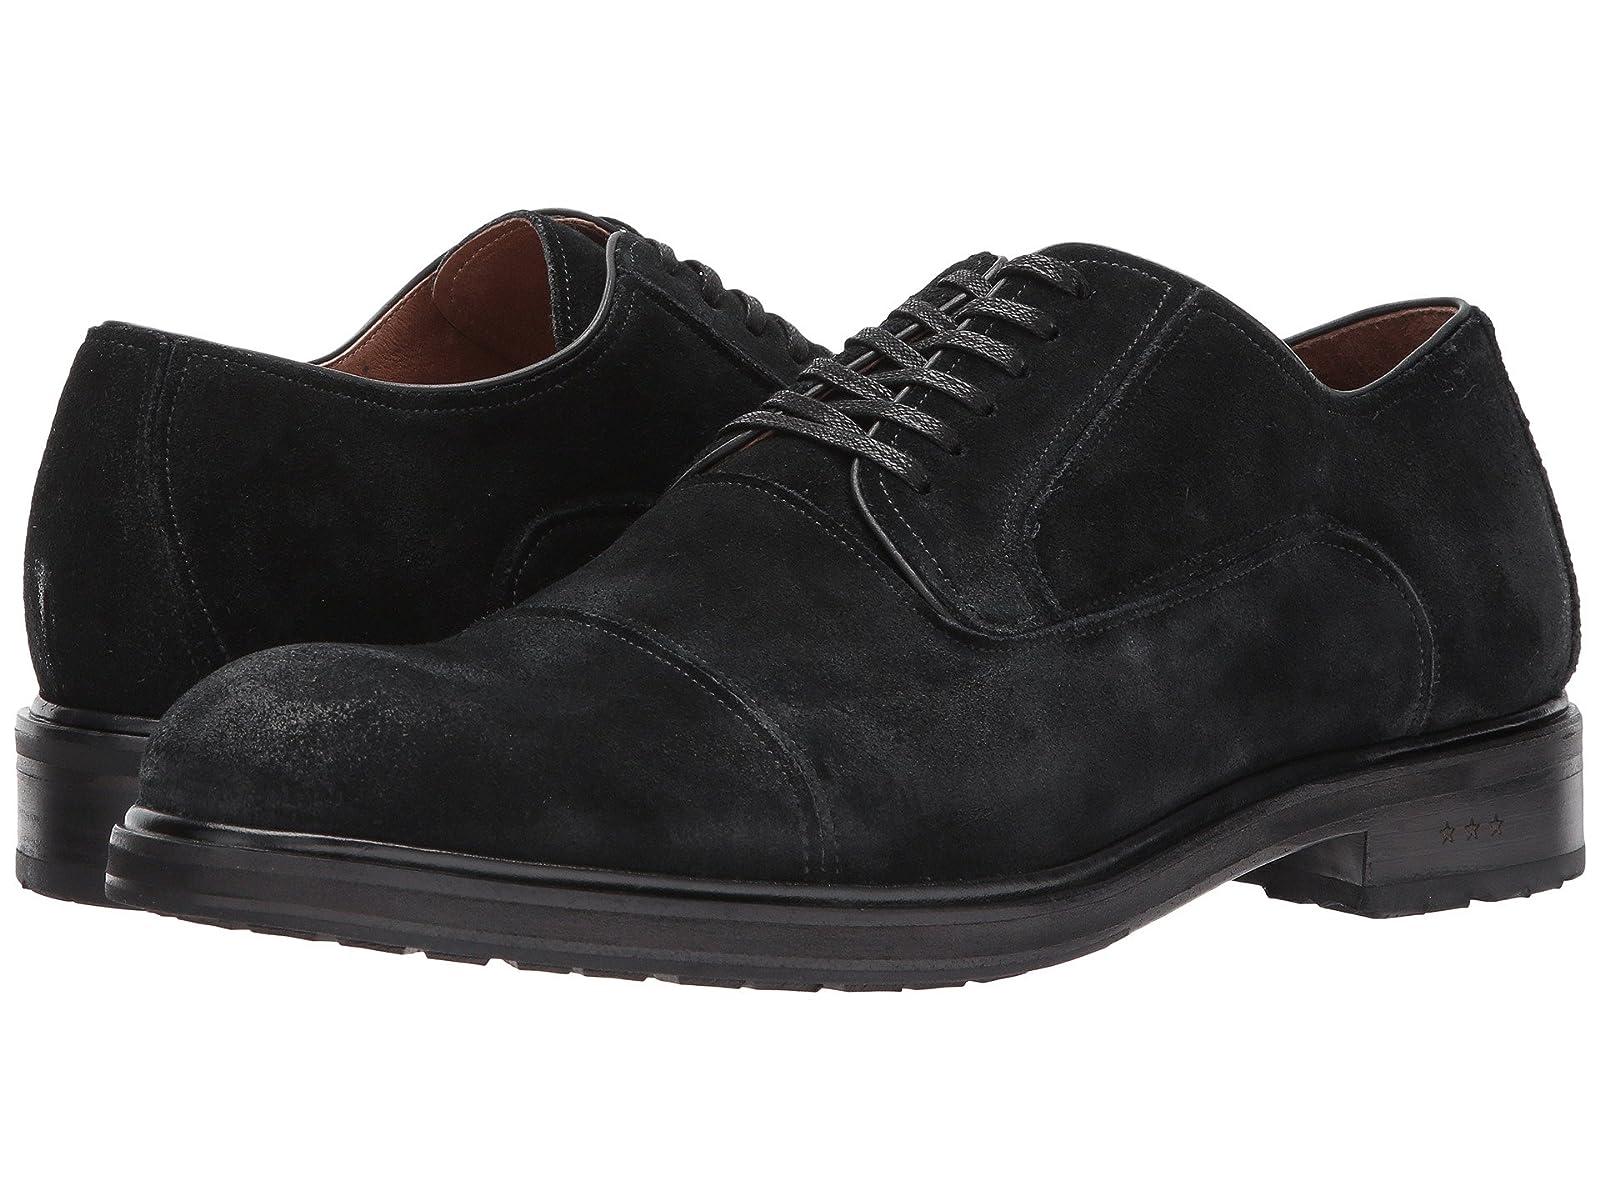 John Varvatos Waverly Welt DerbyCheap and distinctive eye-catching shoes